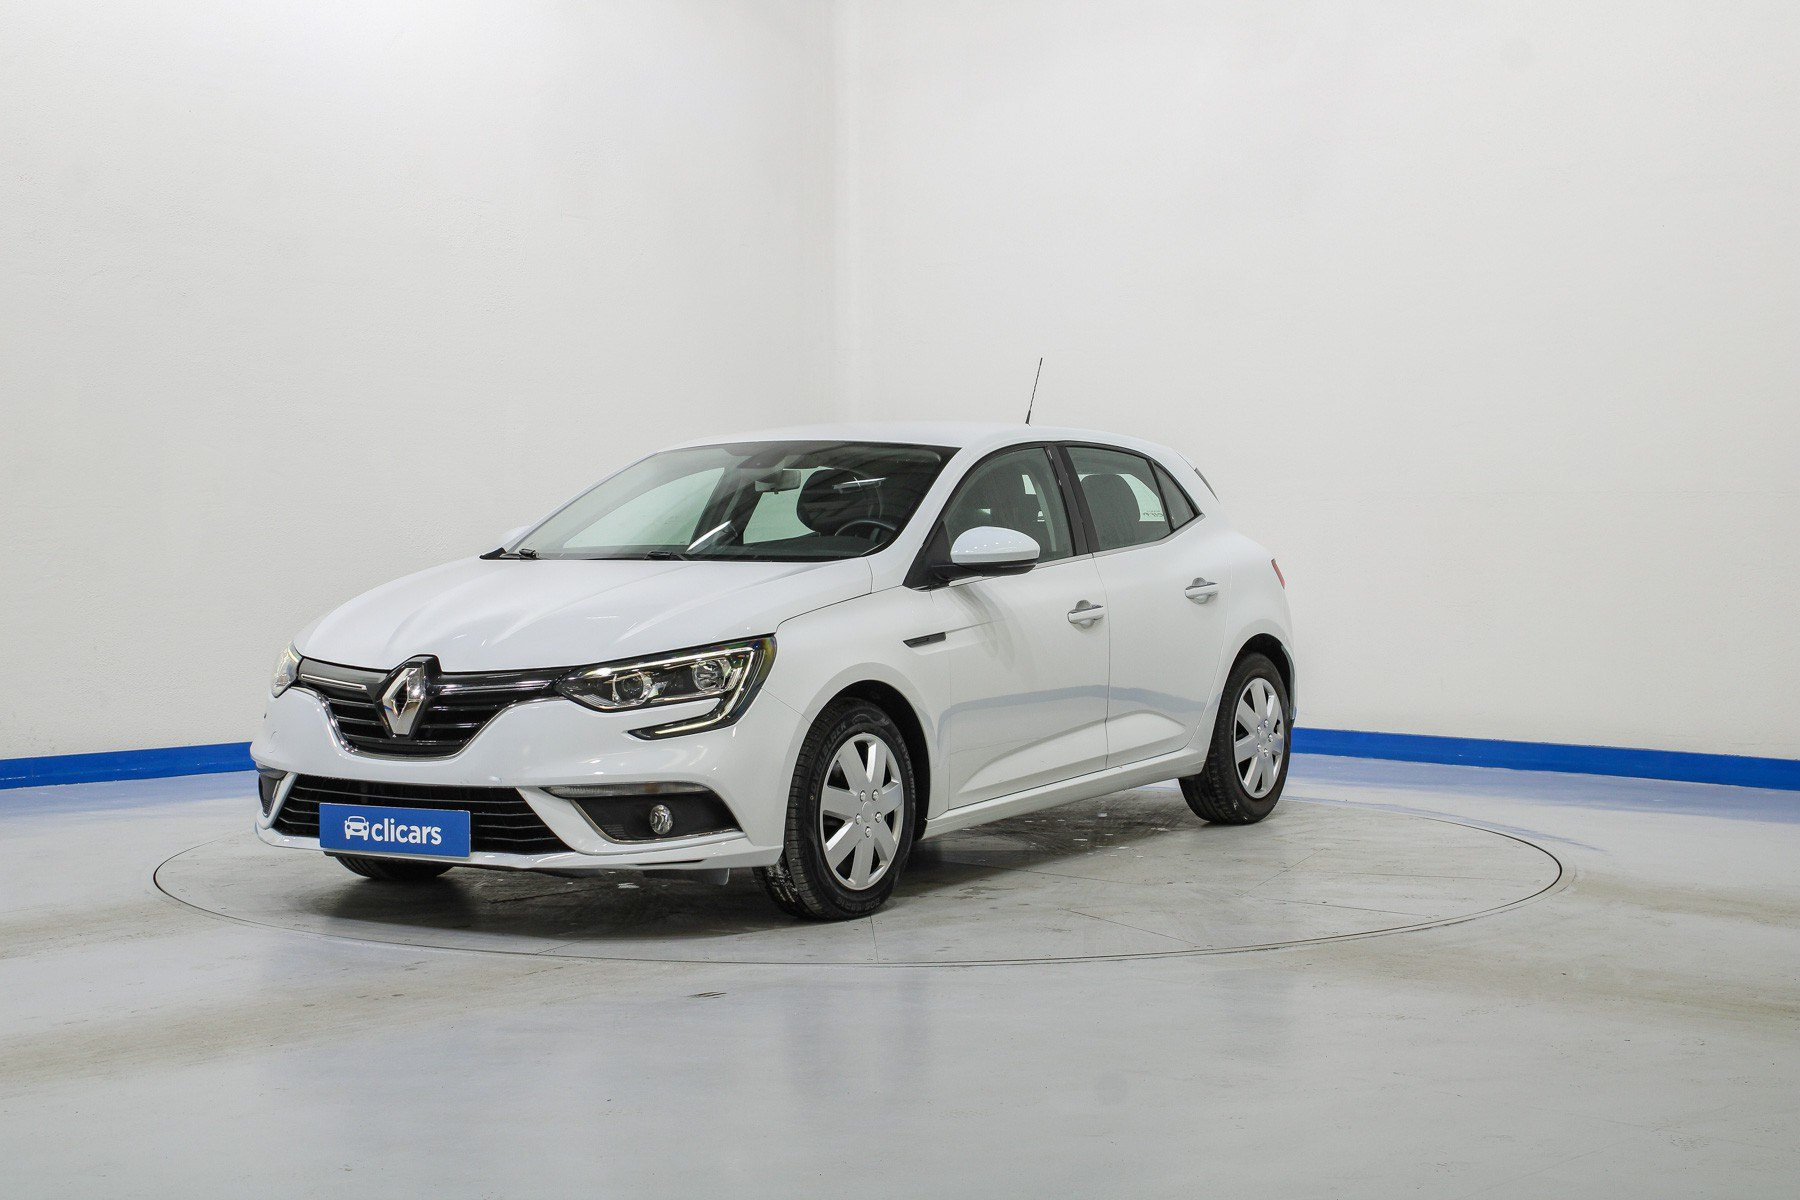 Renault Mégane Diésel Business Energy dCi 81kW (110CV) 1